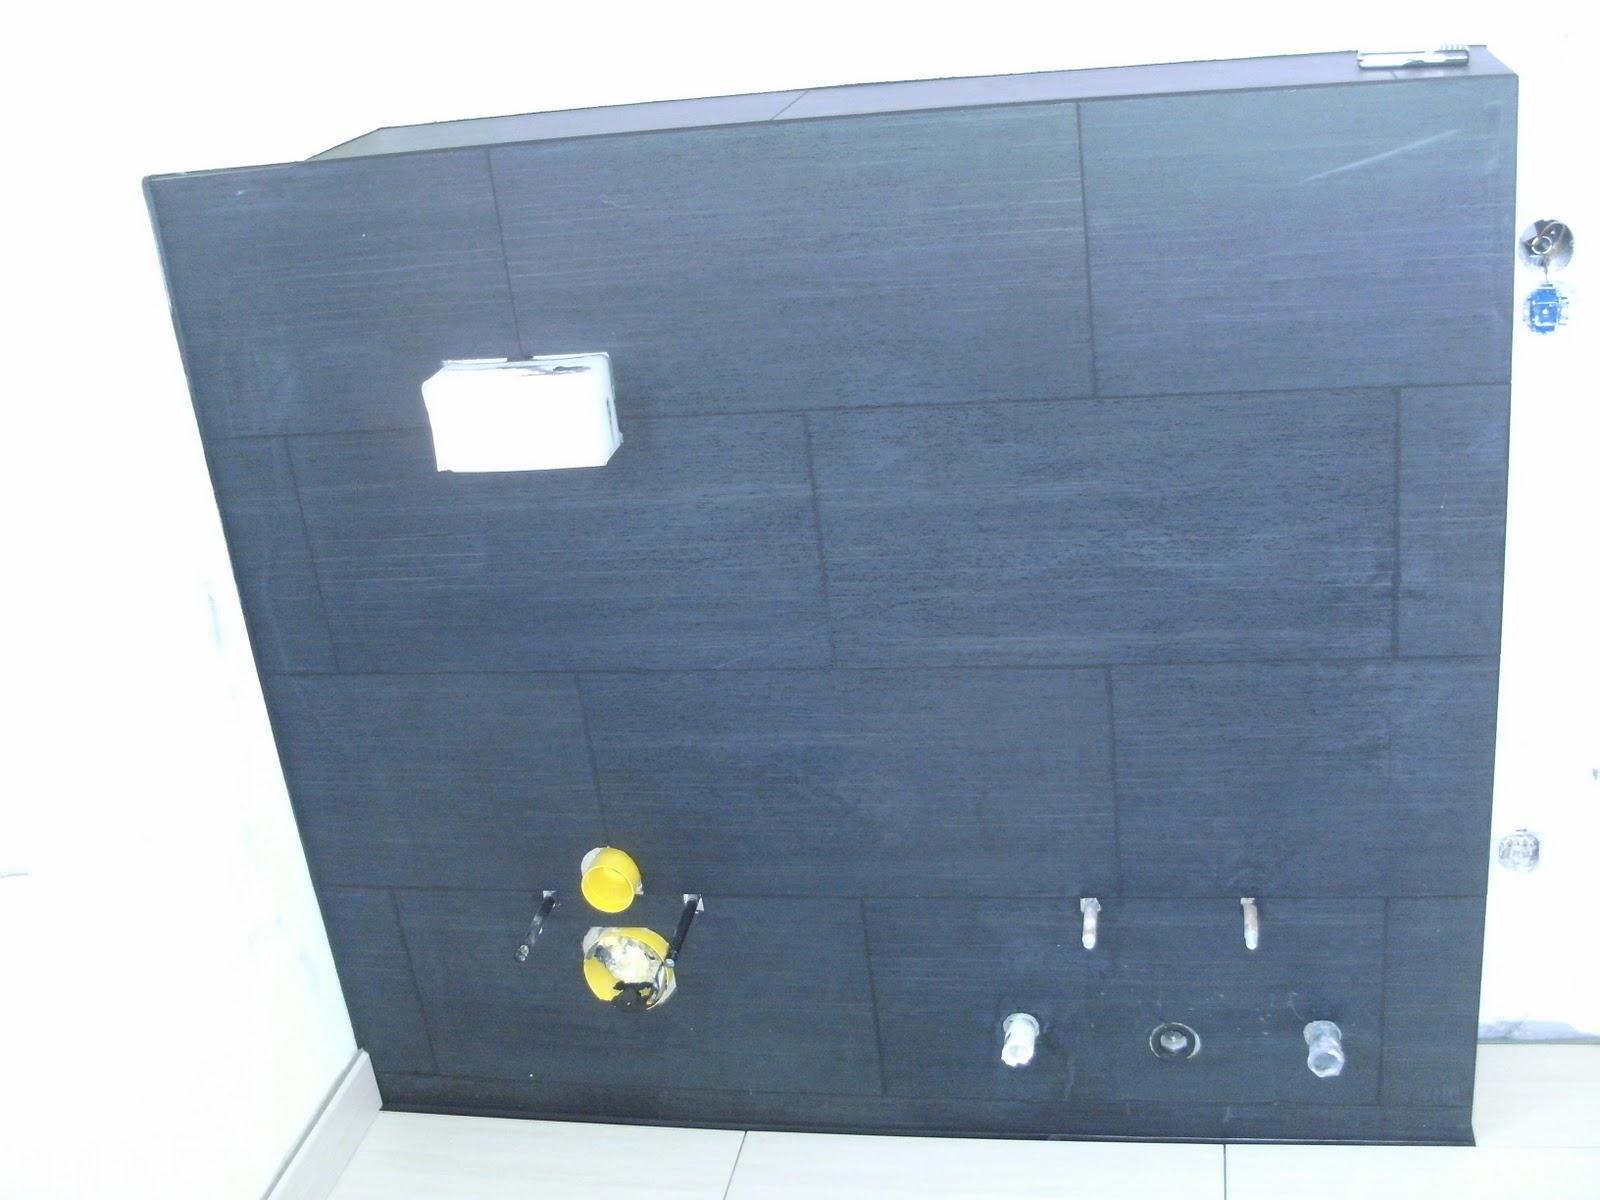 stein fliese aktuell dezember 2011. Black Bedroom Furniture Sets. Home Design Ideas